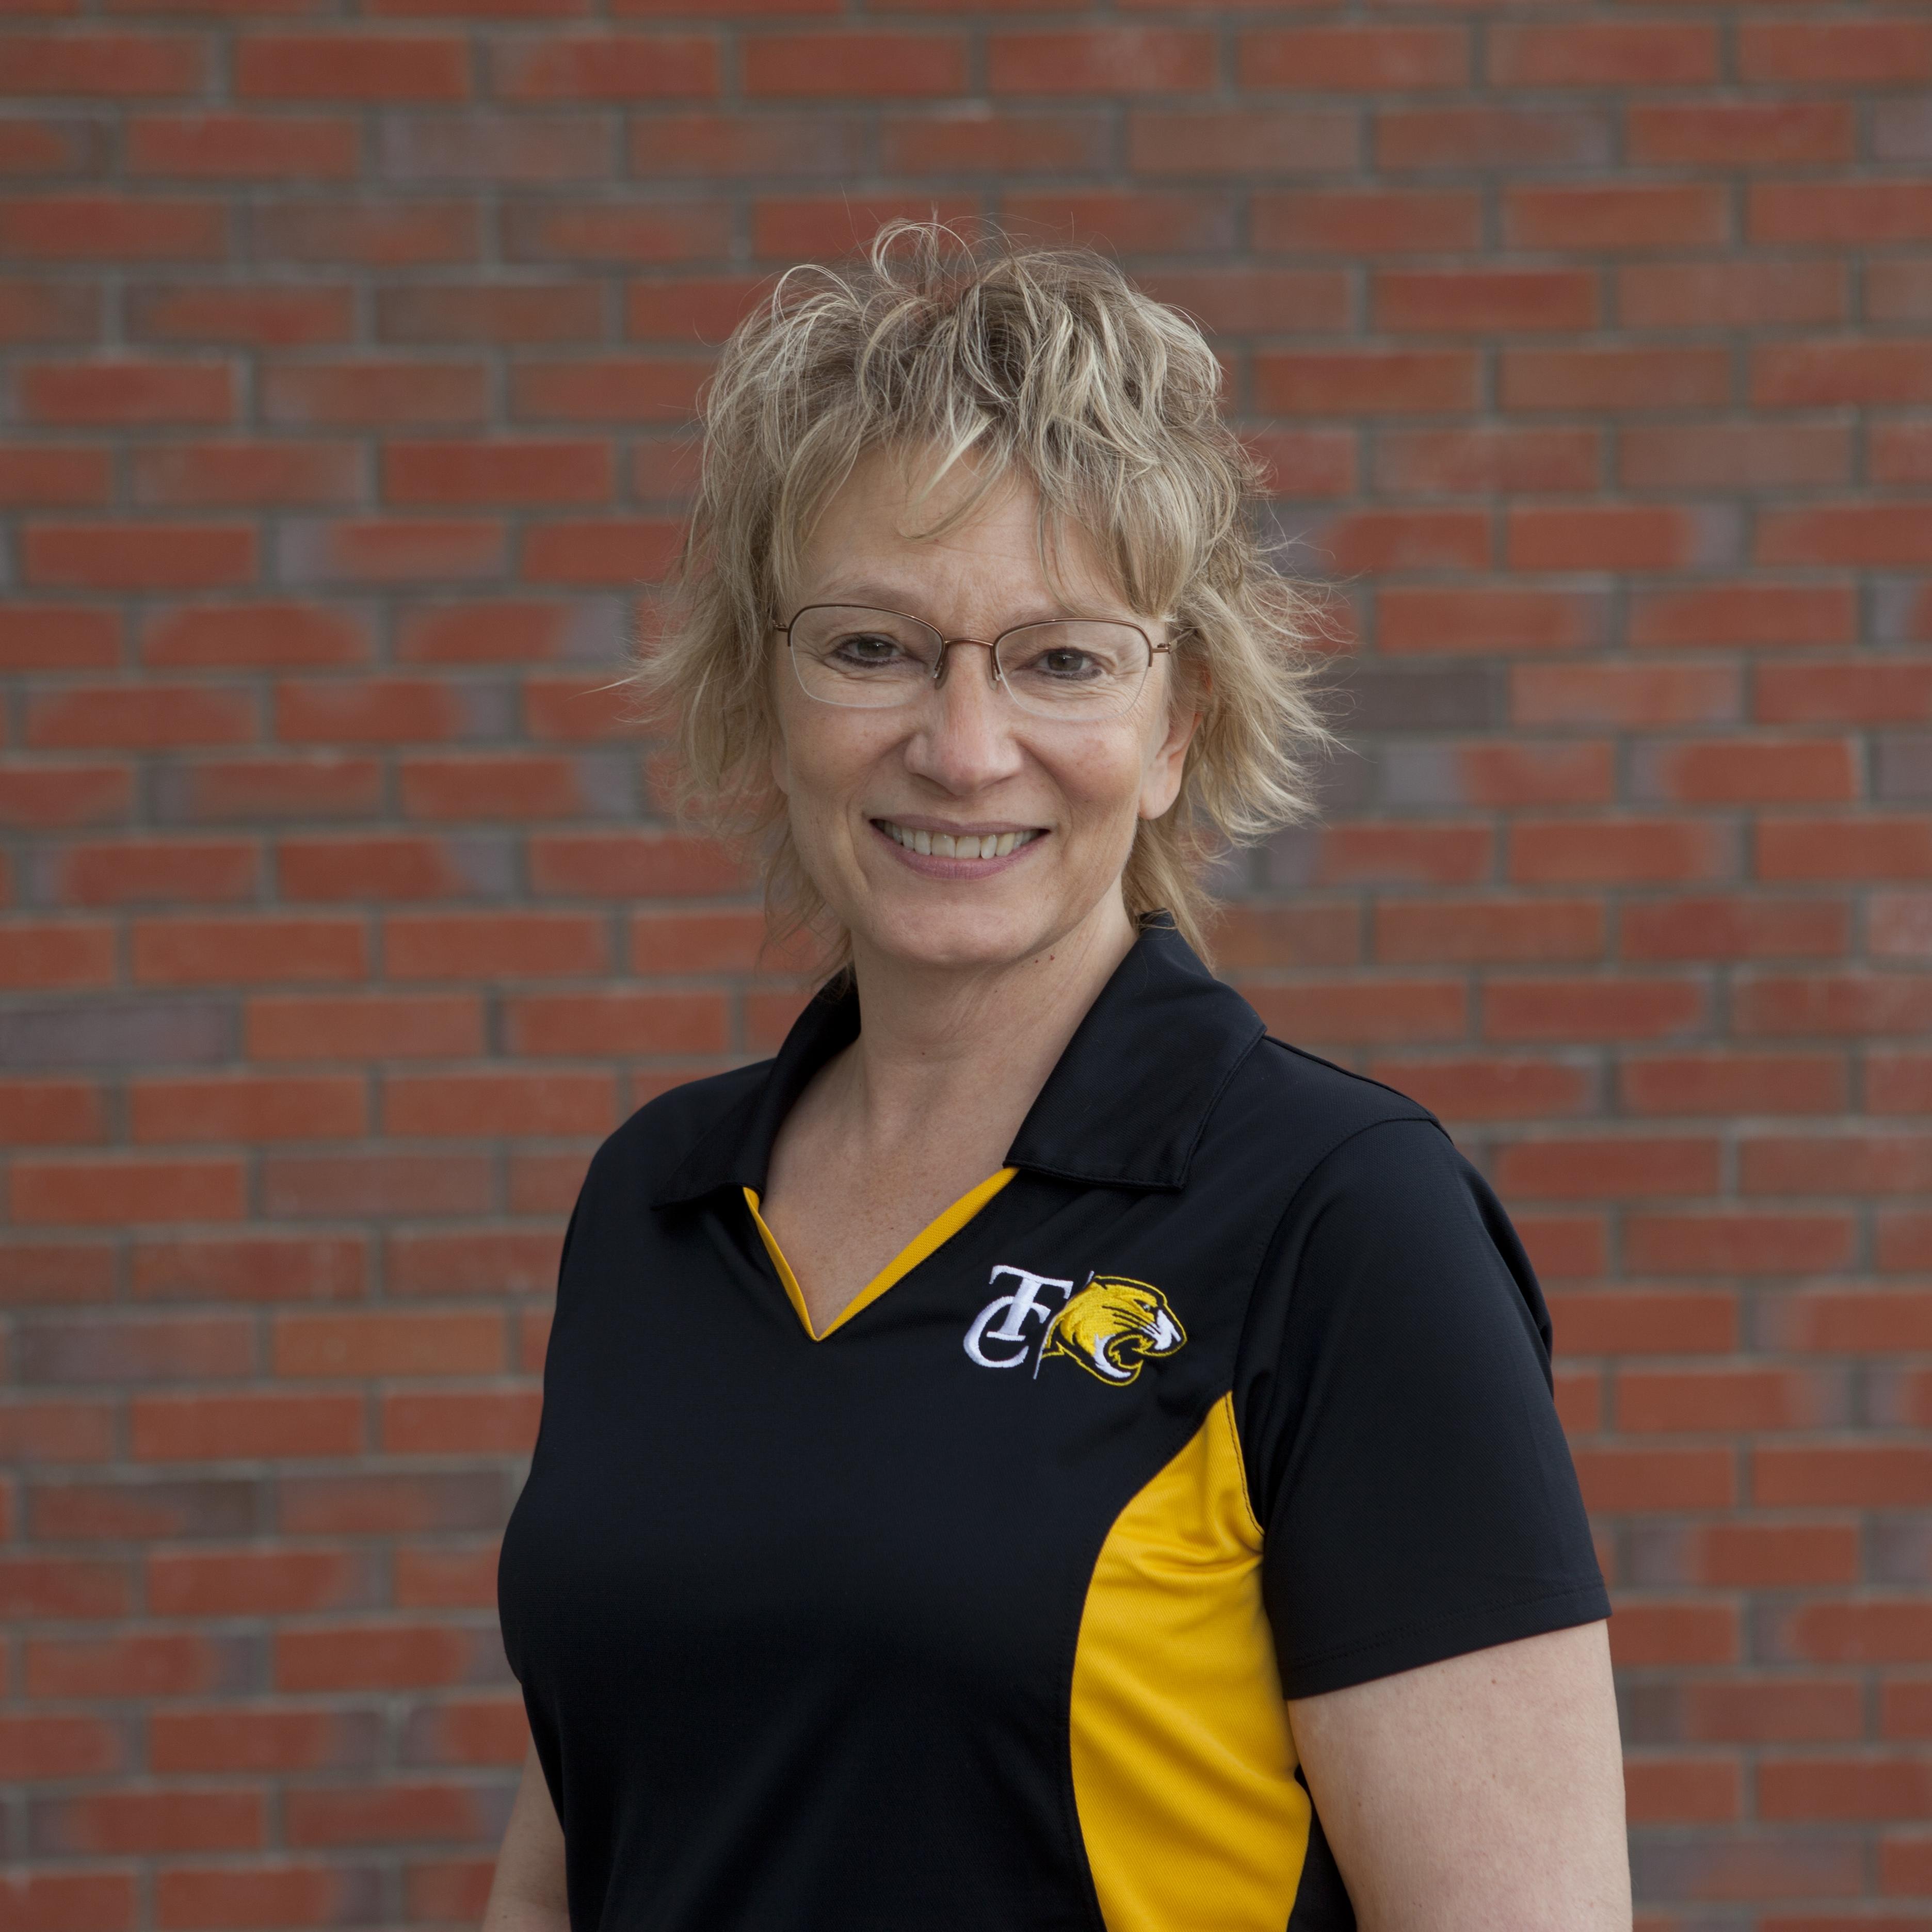 Janis Mendenhall